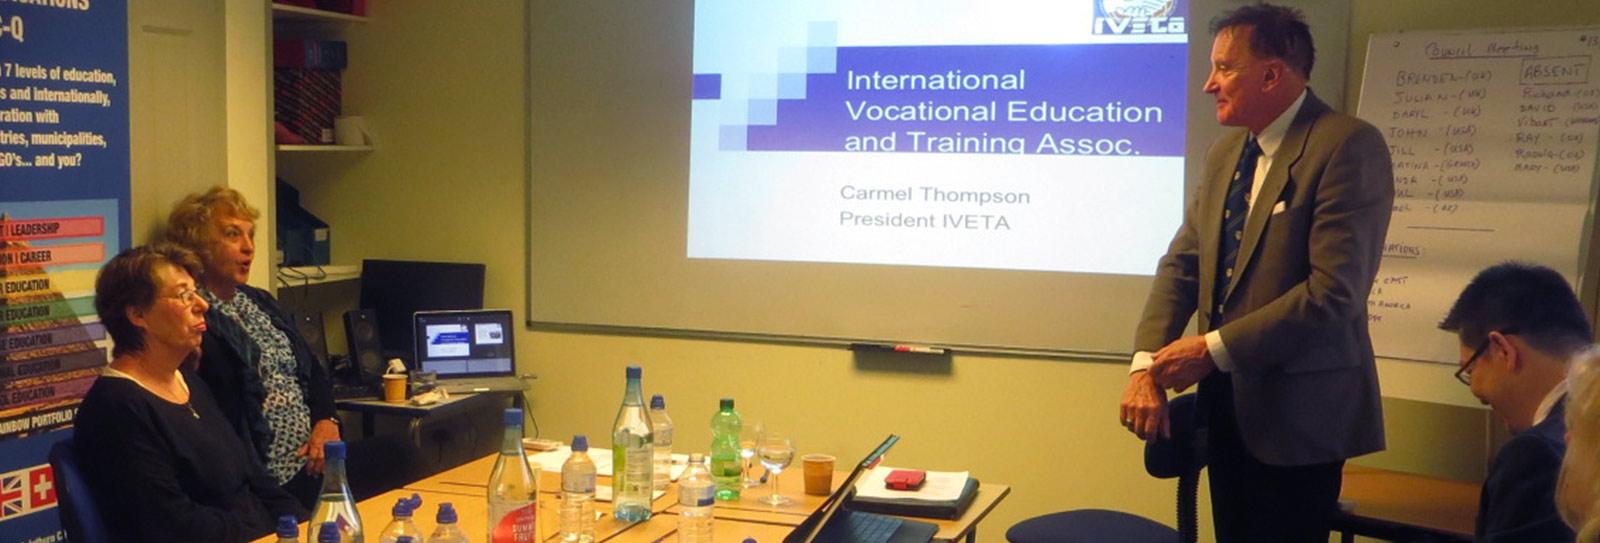 Dr Brenden Tempest-Mogg, Ms Carmel Thompson and Dr Jill Kiefer at an IVETA presentation